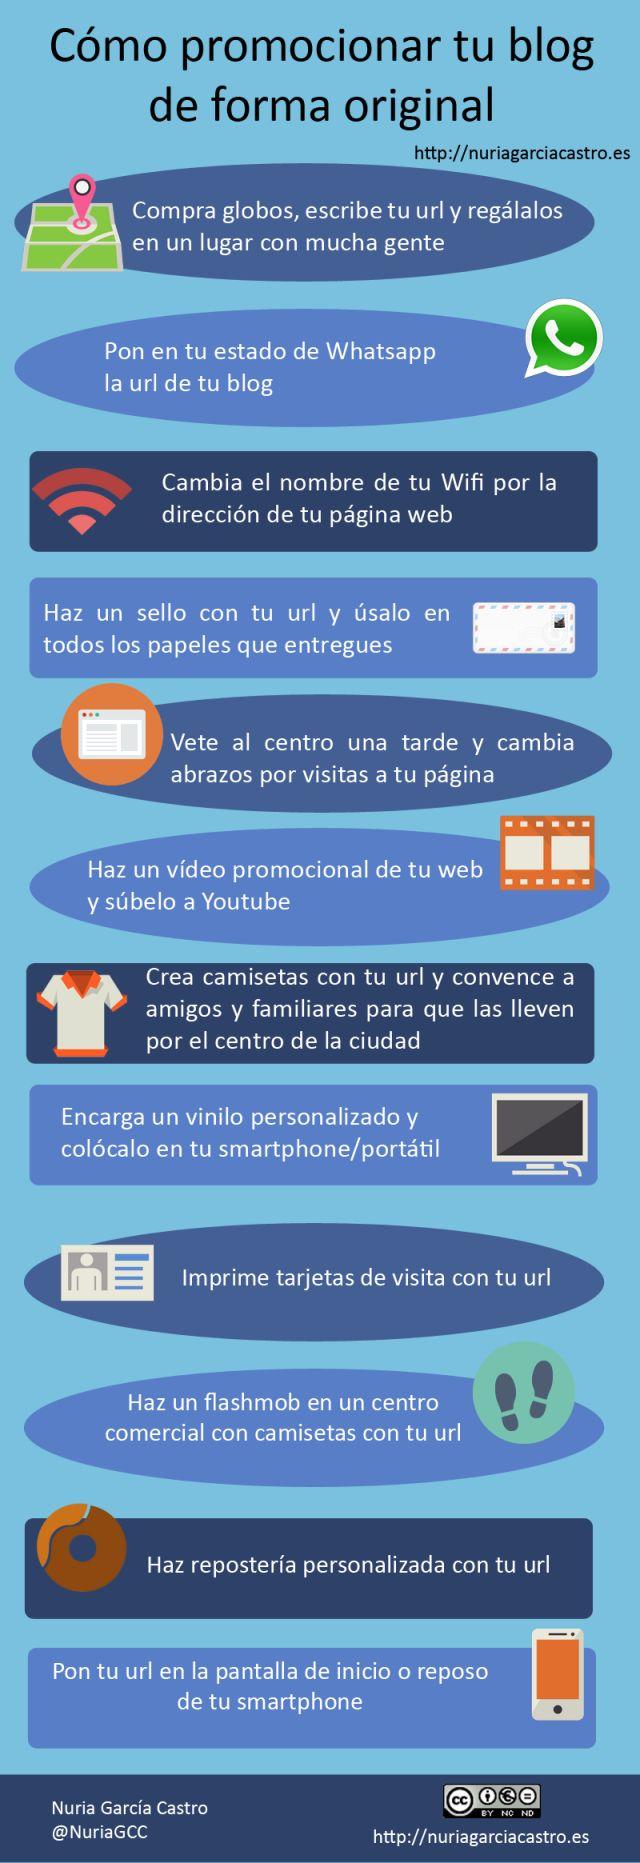 Cómo promocional tu blog de forma original Infografia en español. #CommunityManager